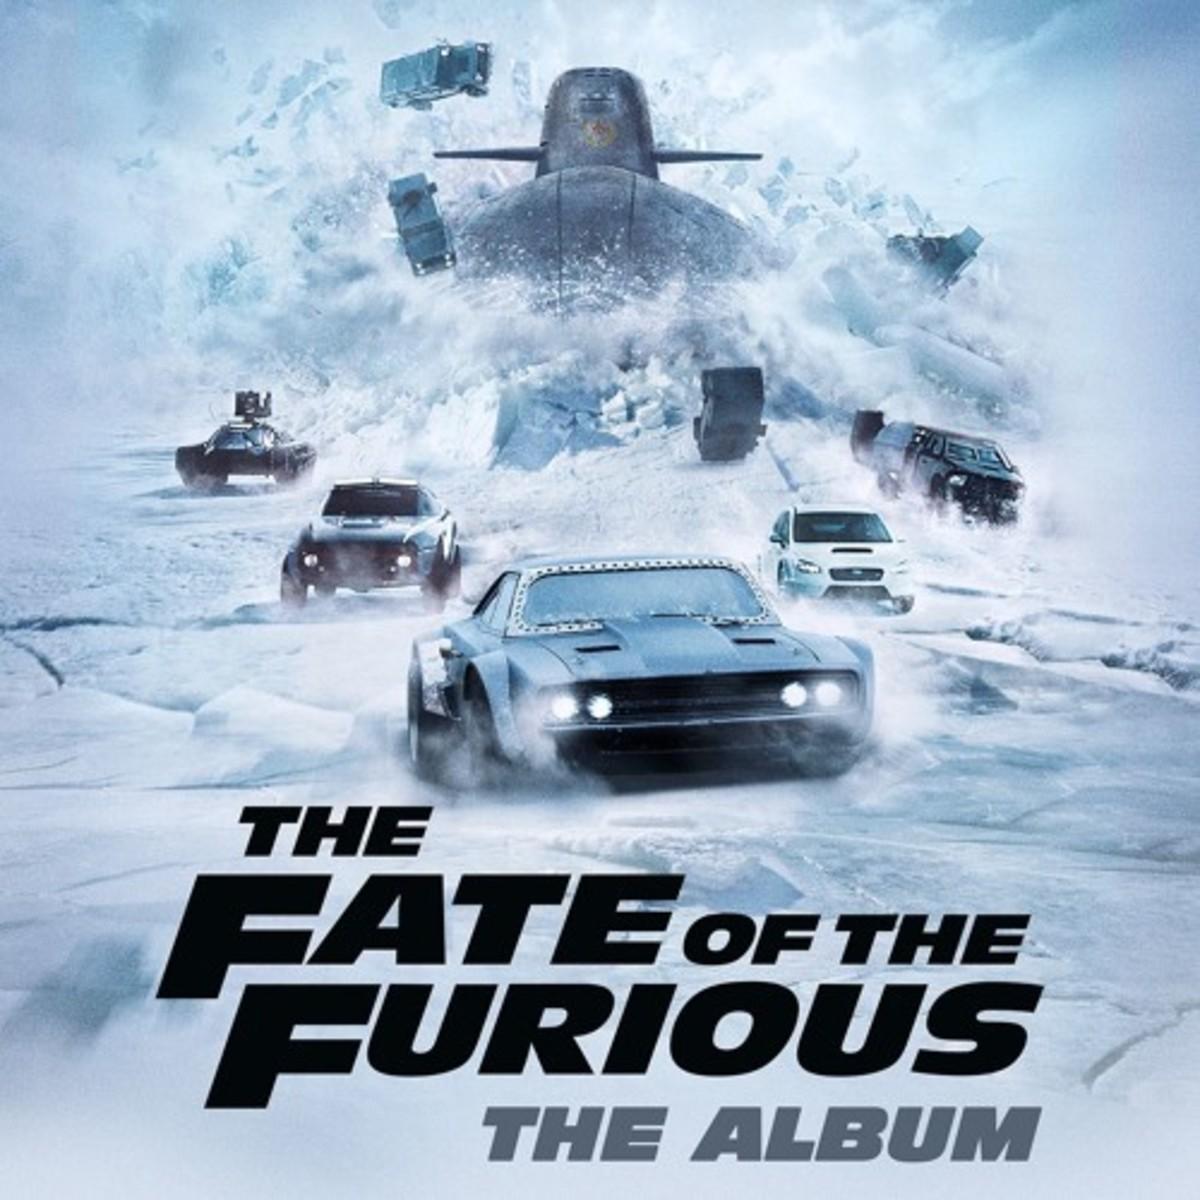 the-fate-of-furious-the-album.jpg